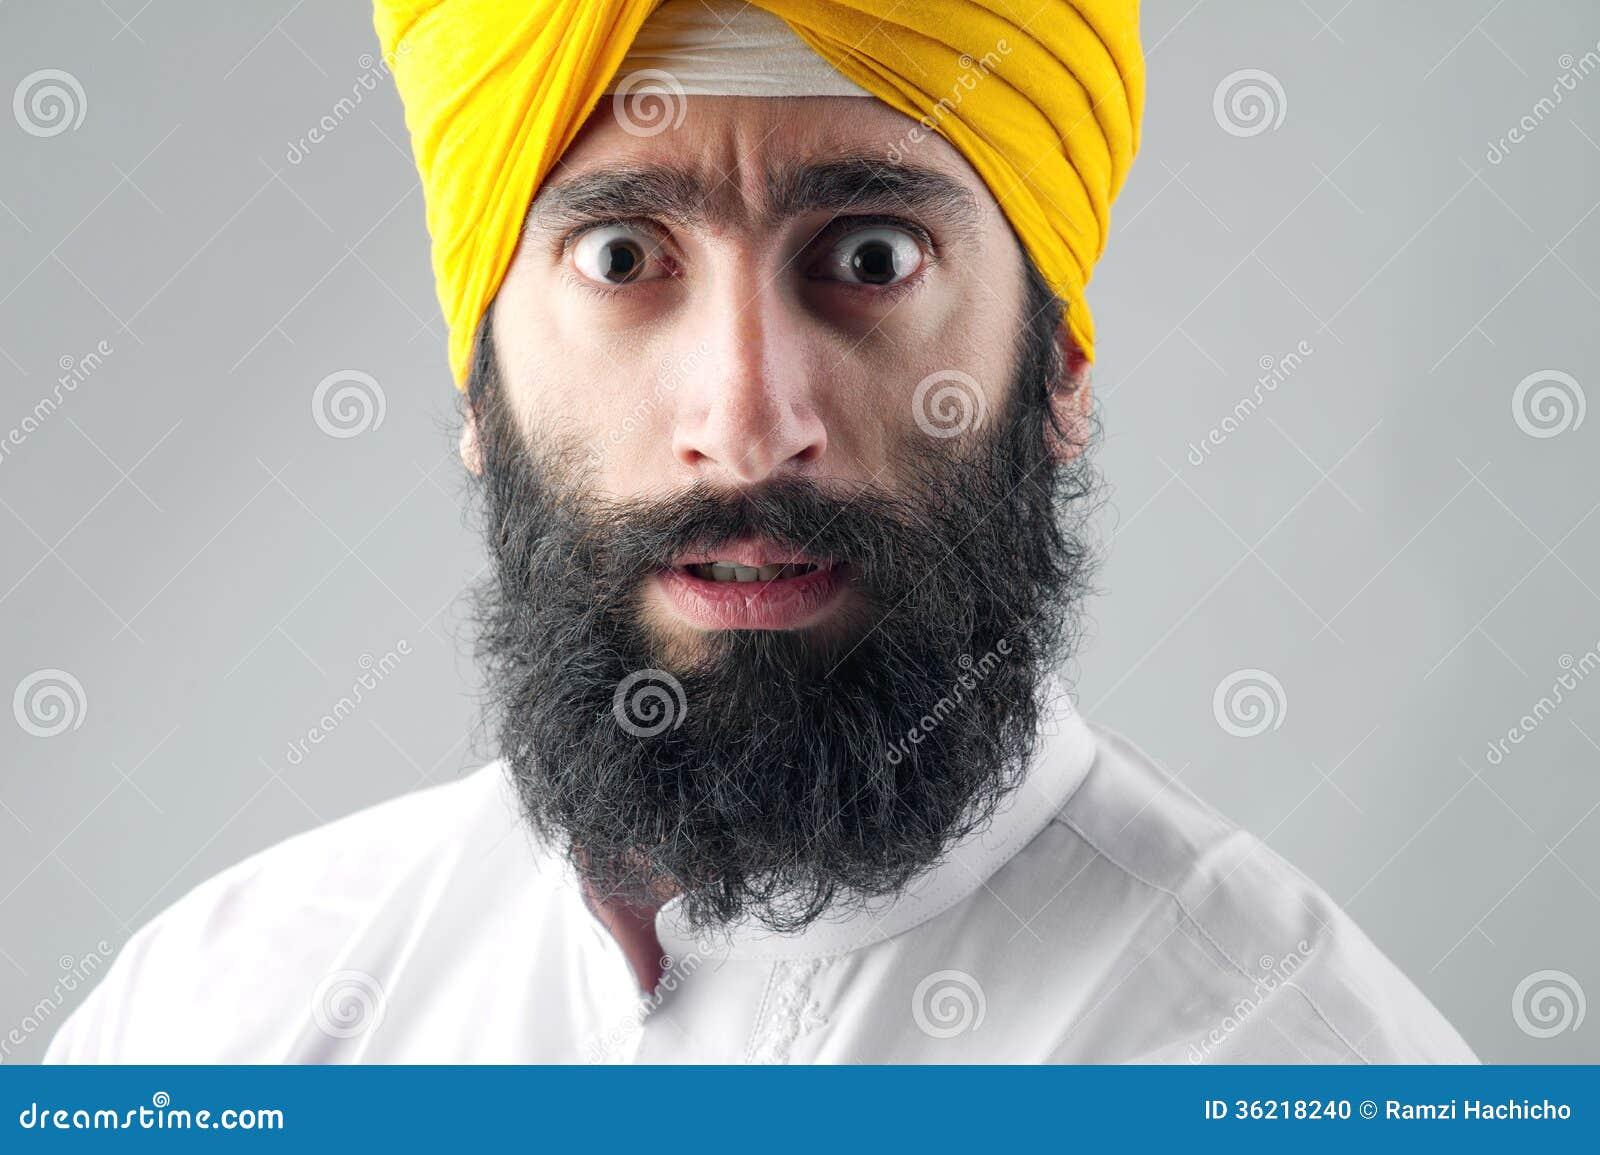 portrait of indian sikh man with bushy beard stock photo image 36218240. Black Bedroom Furniture Sets. Home Design Ideas